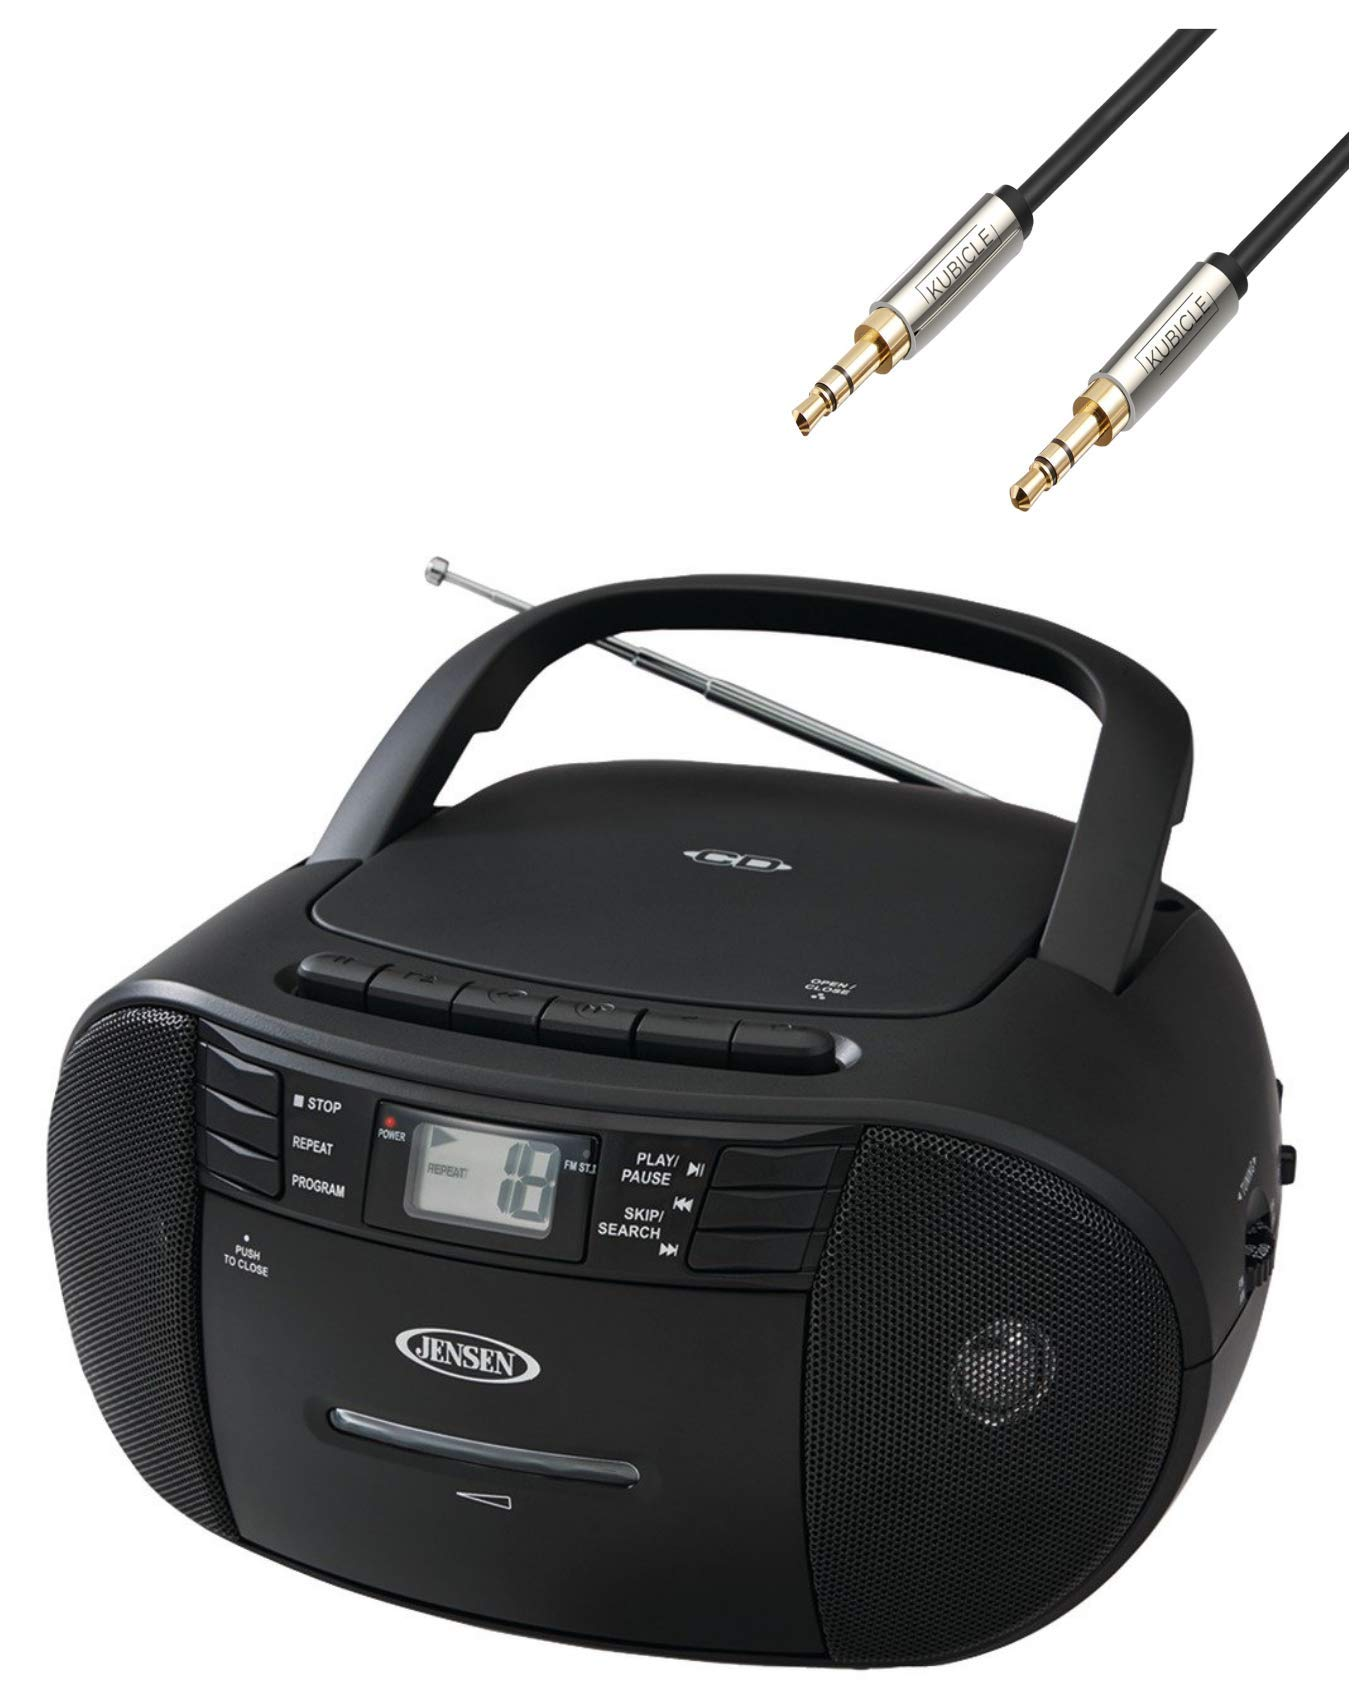 Jensen Portable Stereo CD Cassette Recorder with AM/FM Radio Plus 6ft Kubicle Aux Cable Bundle